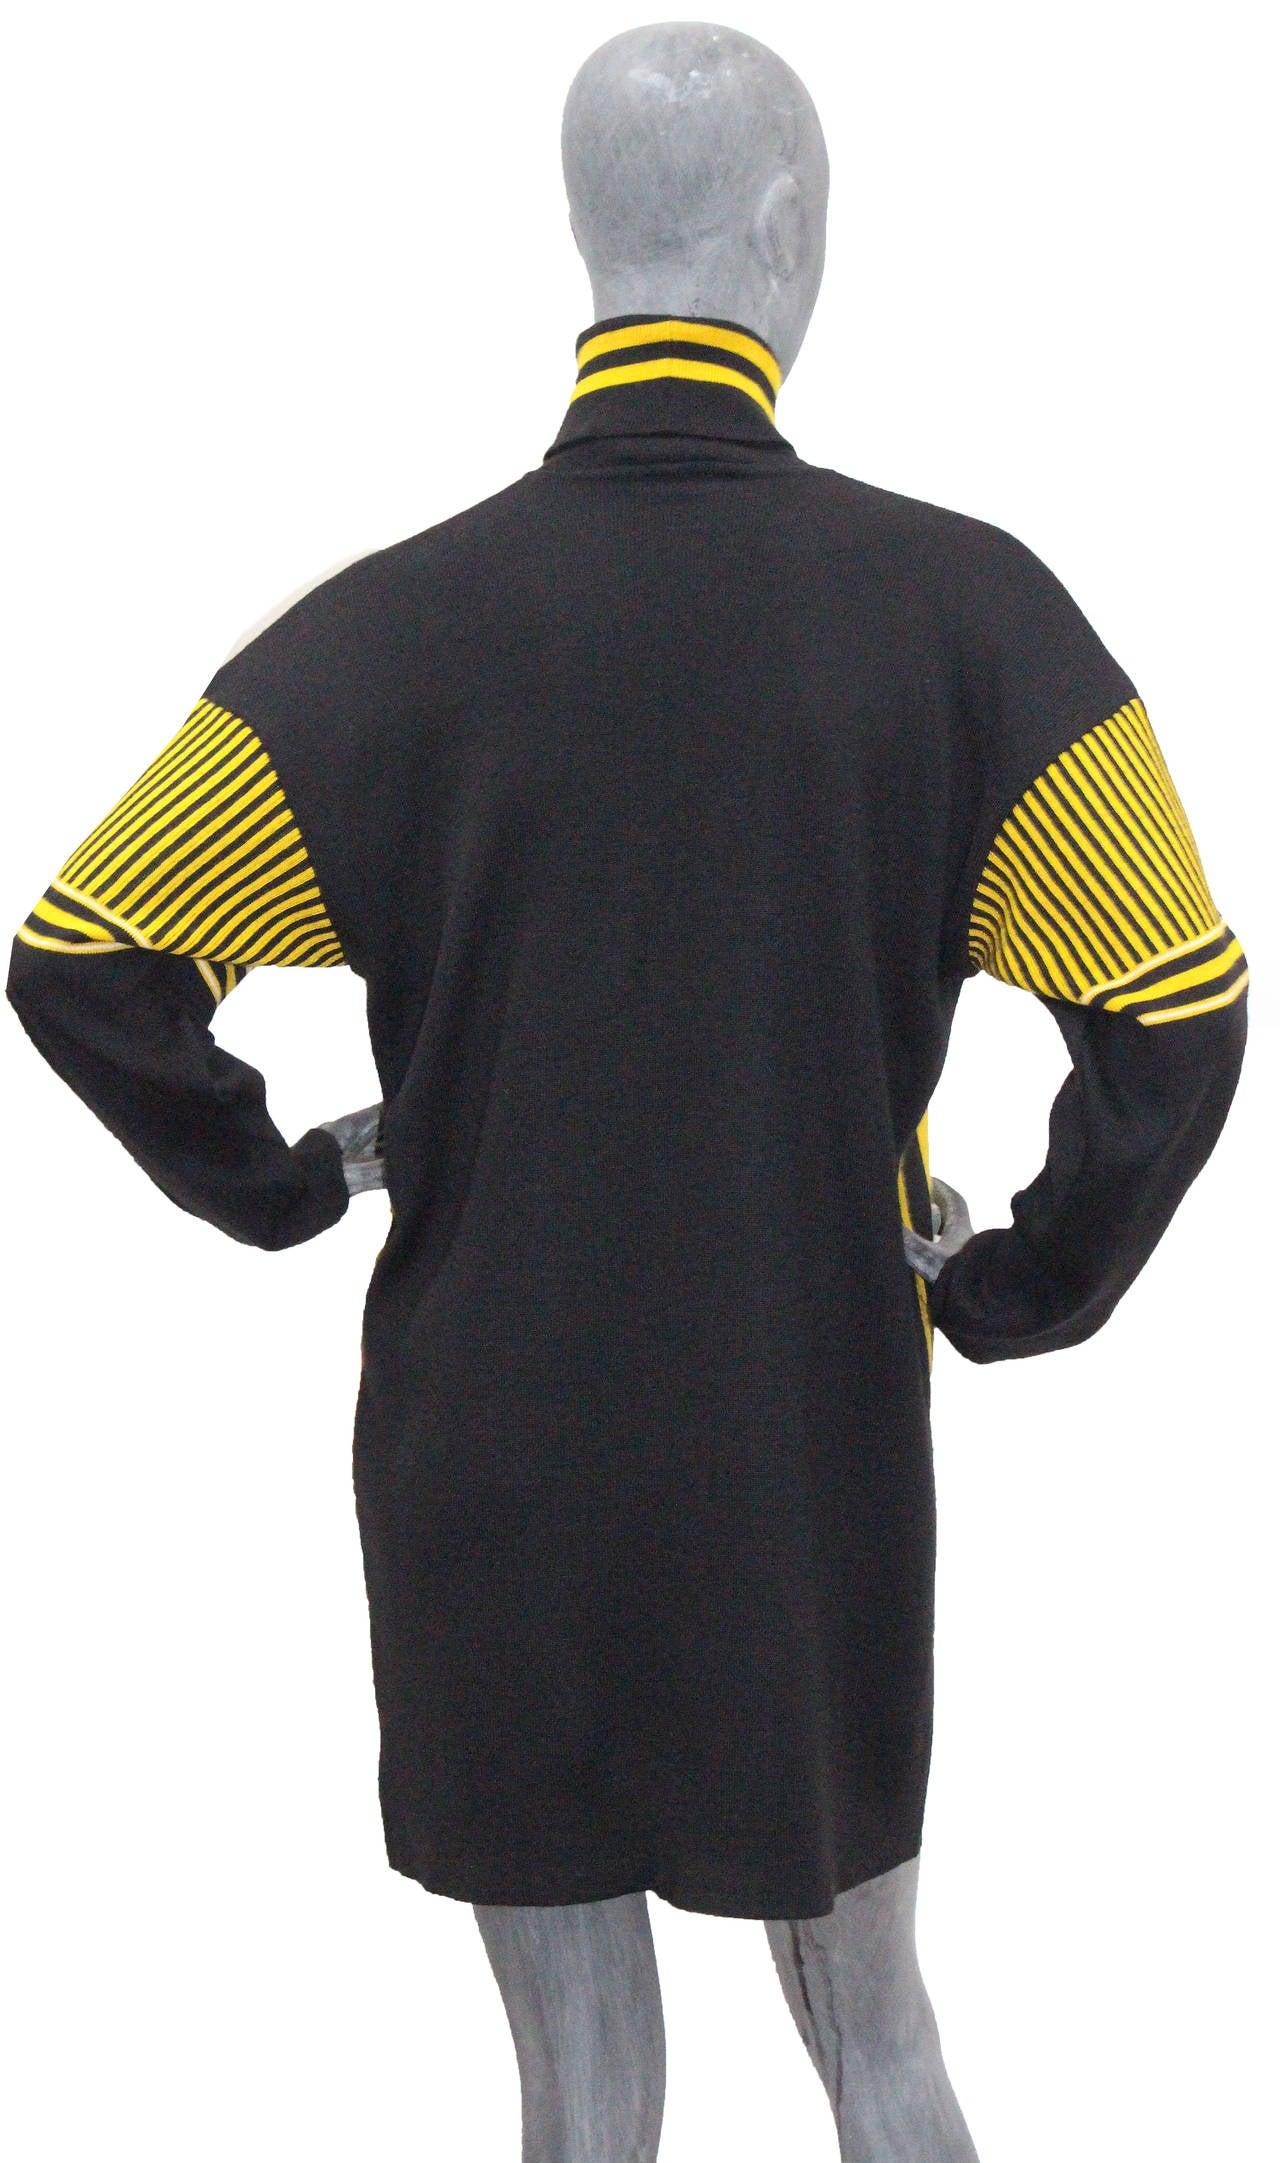 A rare 1980s Jean Paul Gaultier Football Knitted Sweater Dress 1